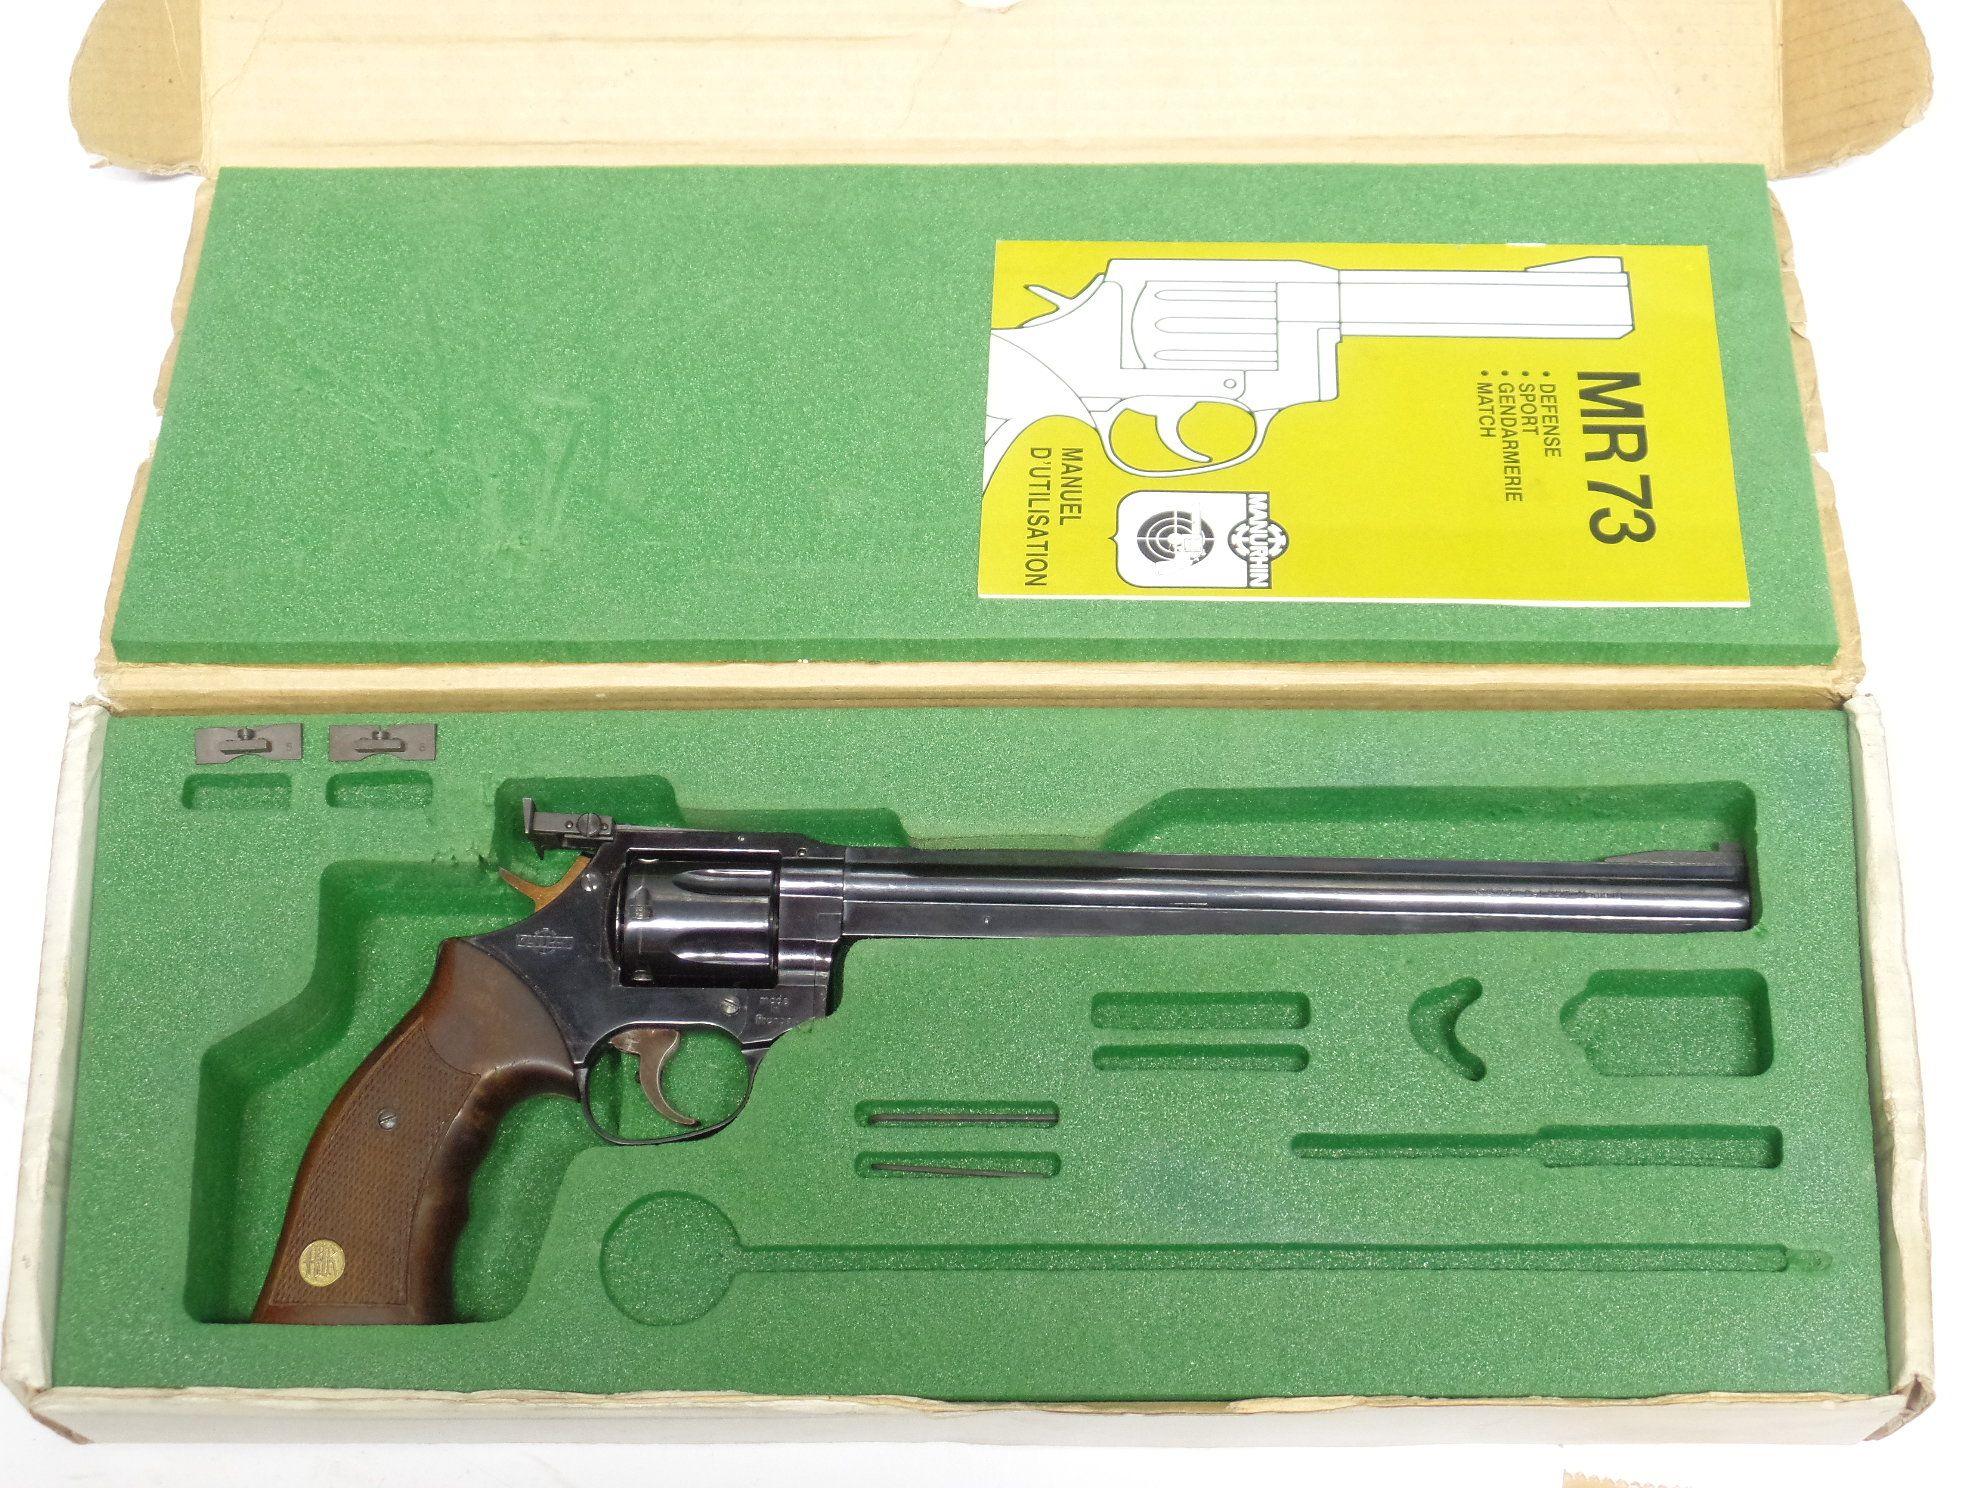 MANURHIN MR73 Silhouette 10 pouce calibre 357Magnum